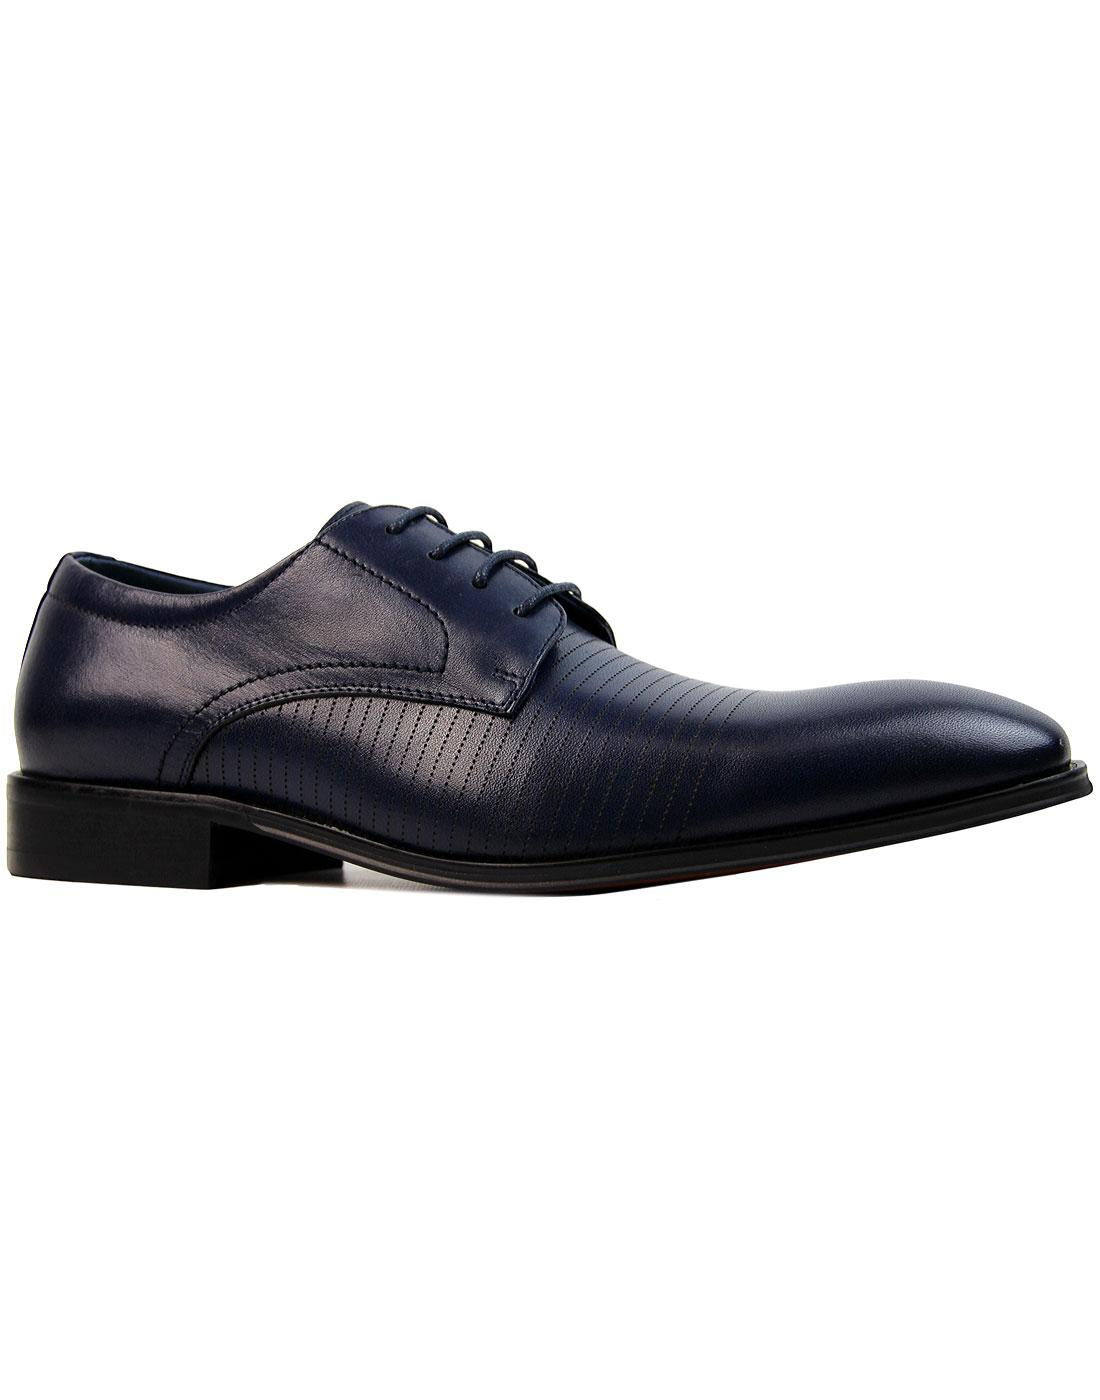 Stu Lace PAOLO VANDINI 60s Mod Pinstripe Shoes (N)